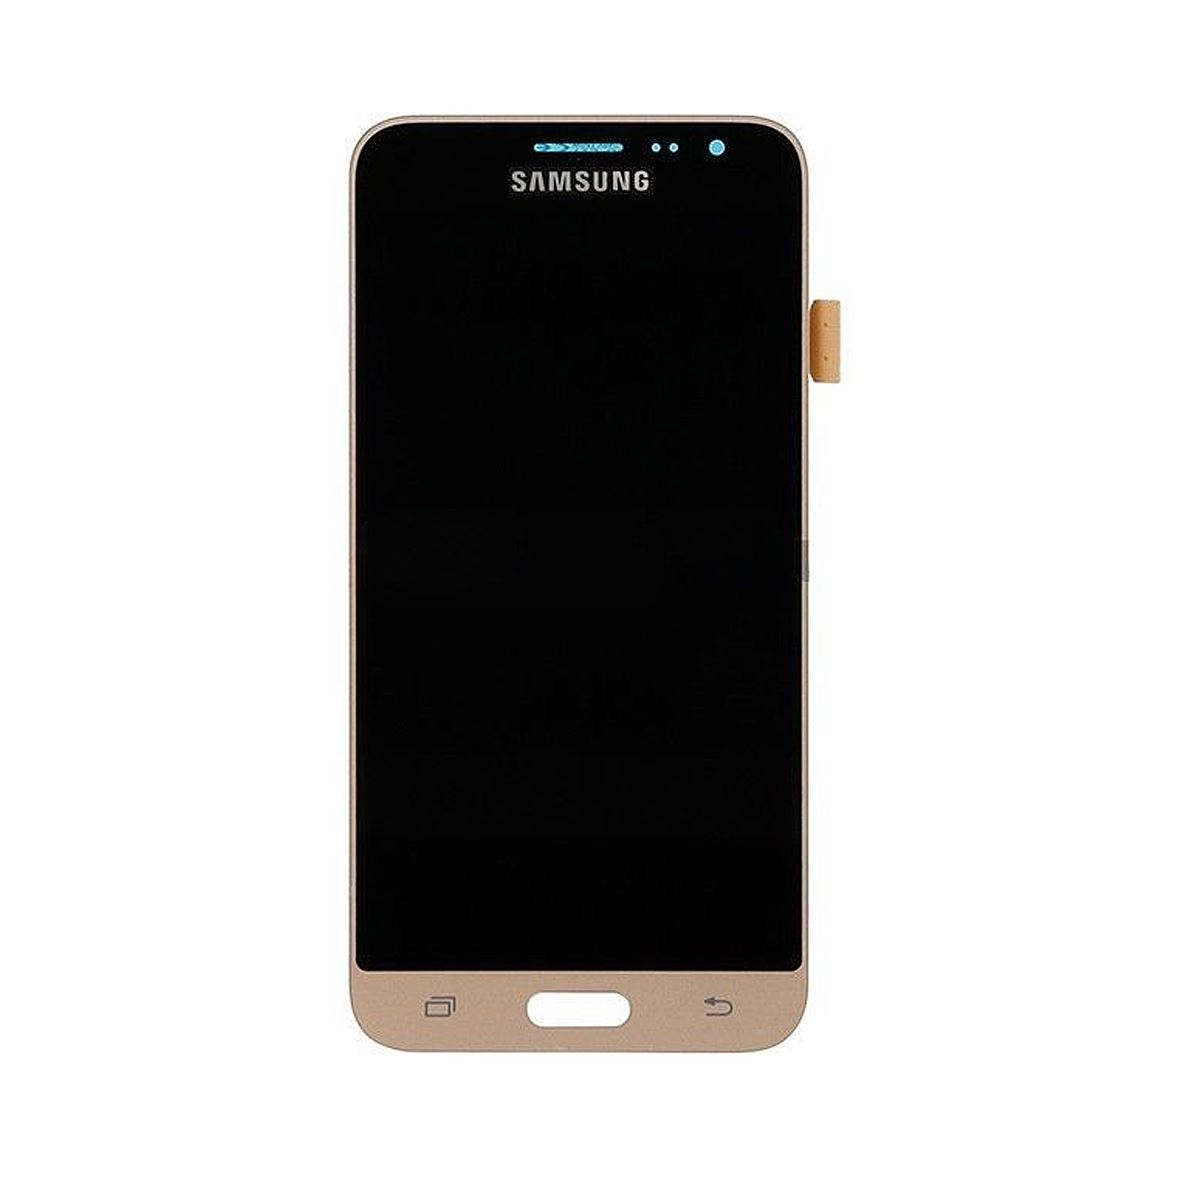 Pantalla-Para-Samsung-Galaxy-J3-J320-J320FN-2016-Completa-LCD-Display-Ecran-AA